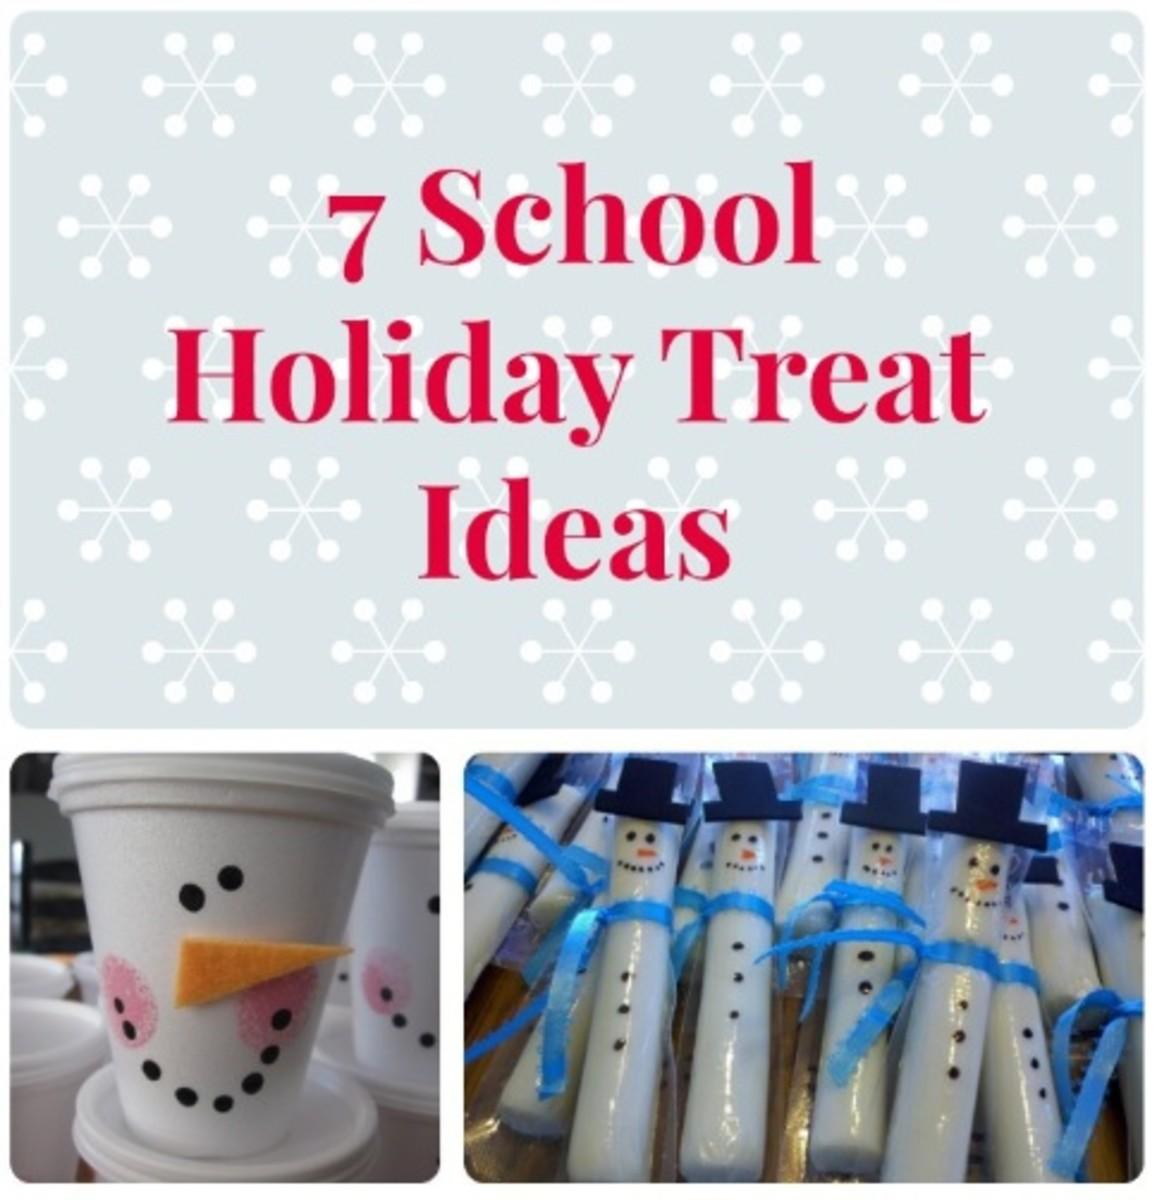 School Holiday Treat Ideas Featured